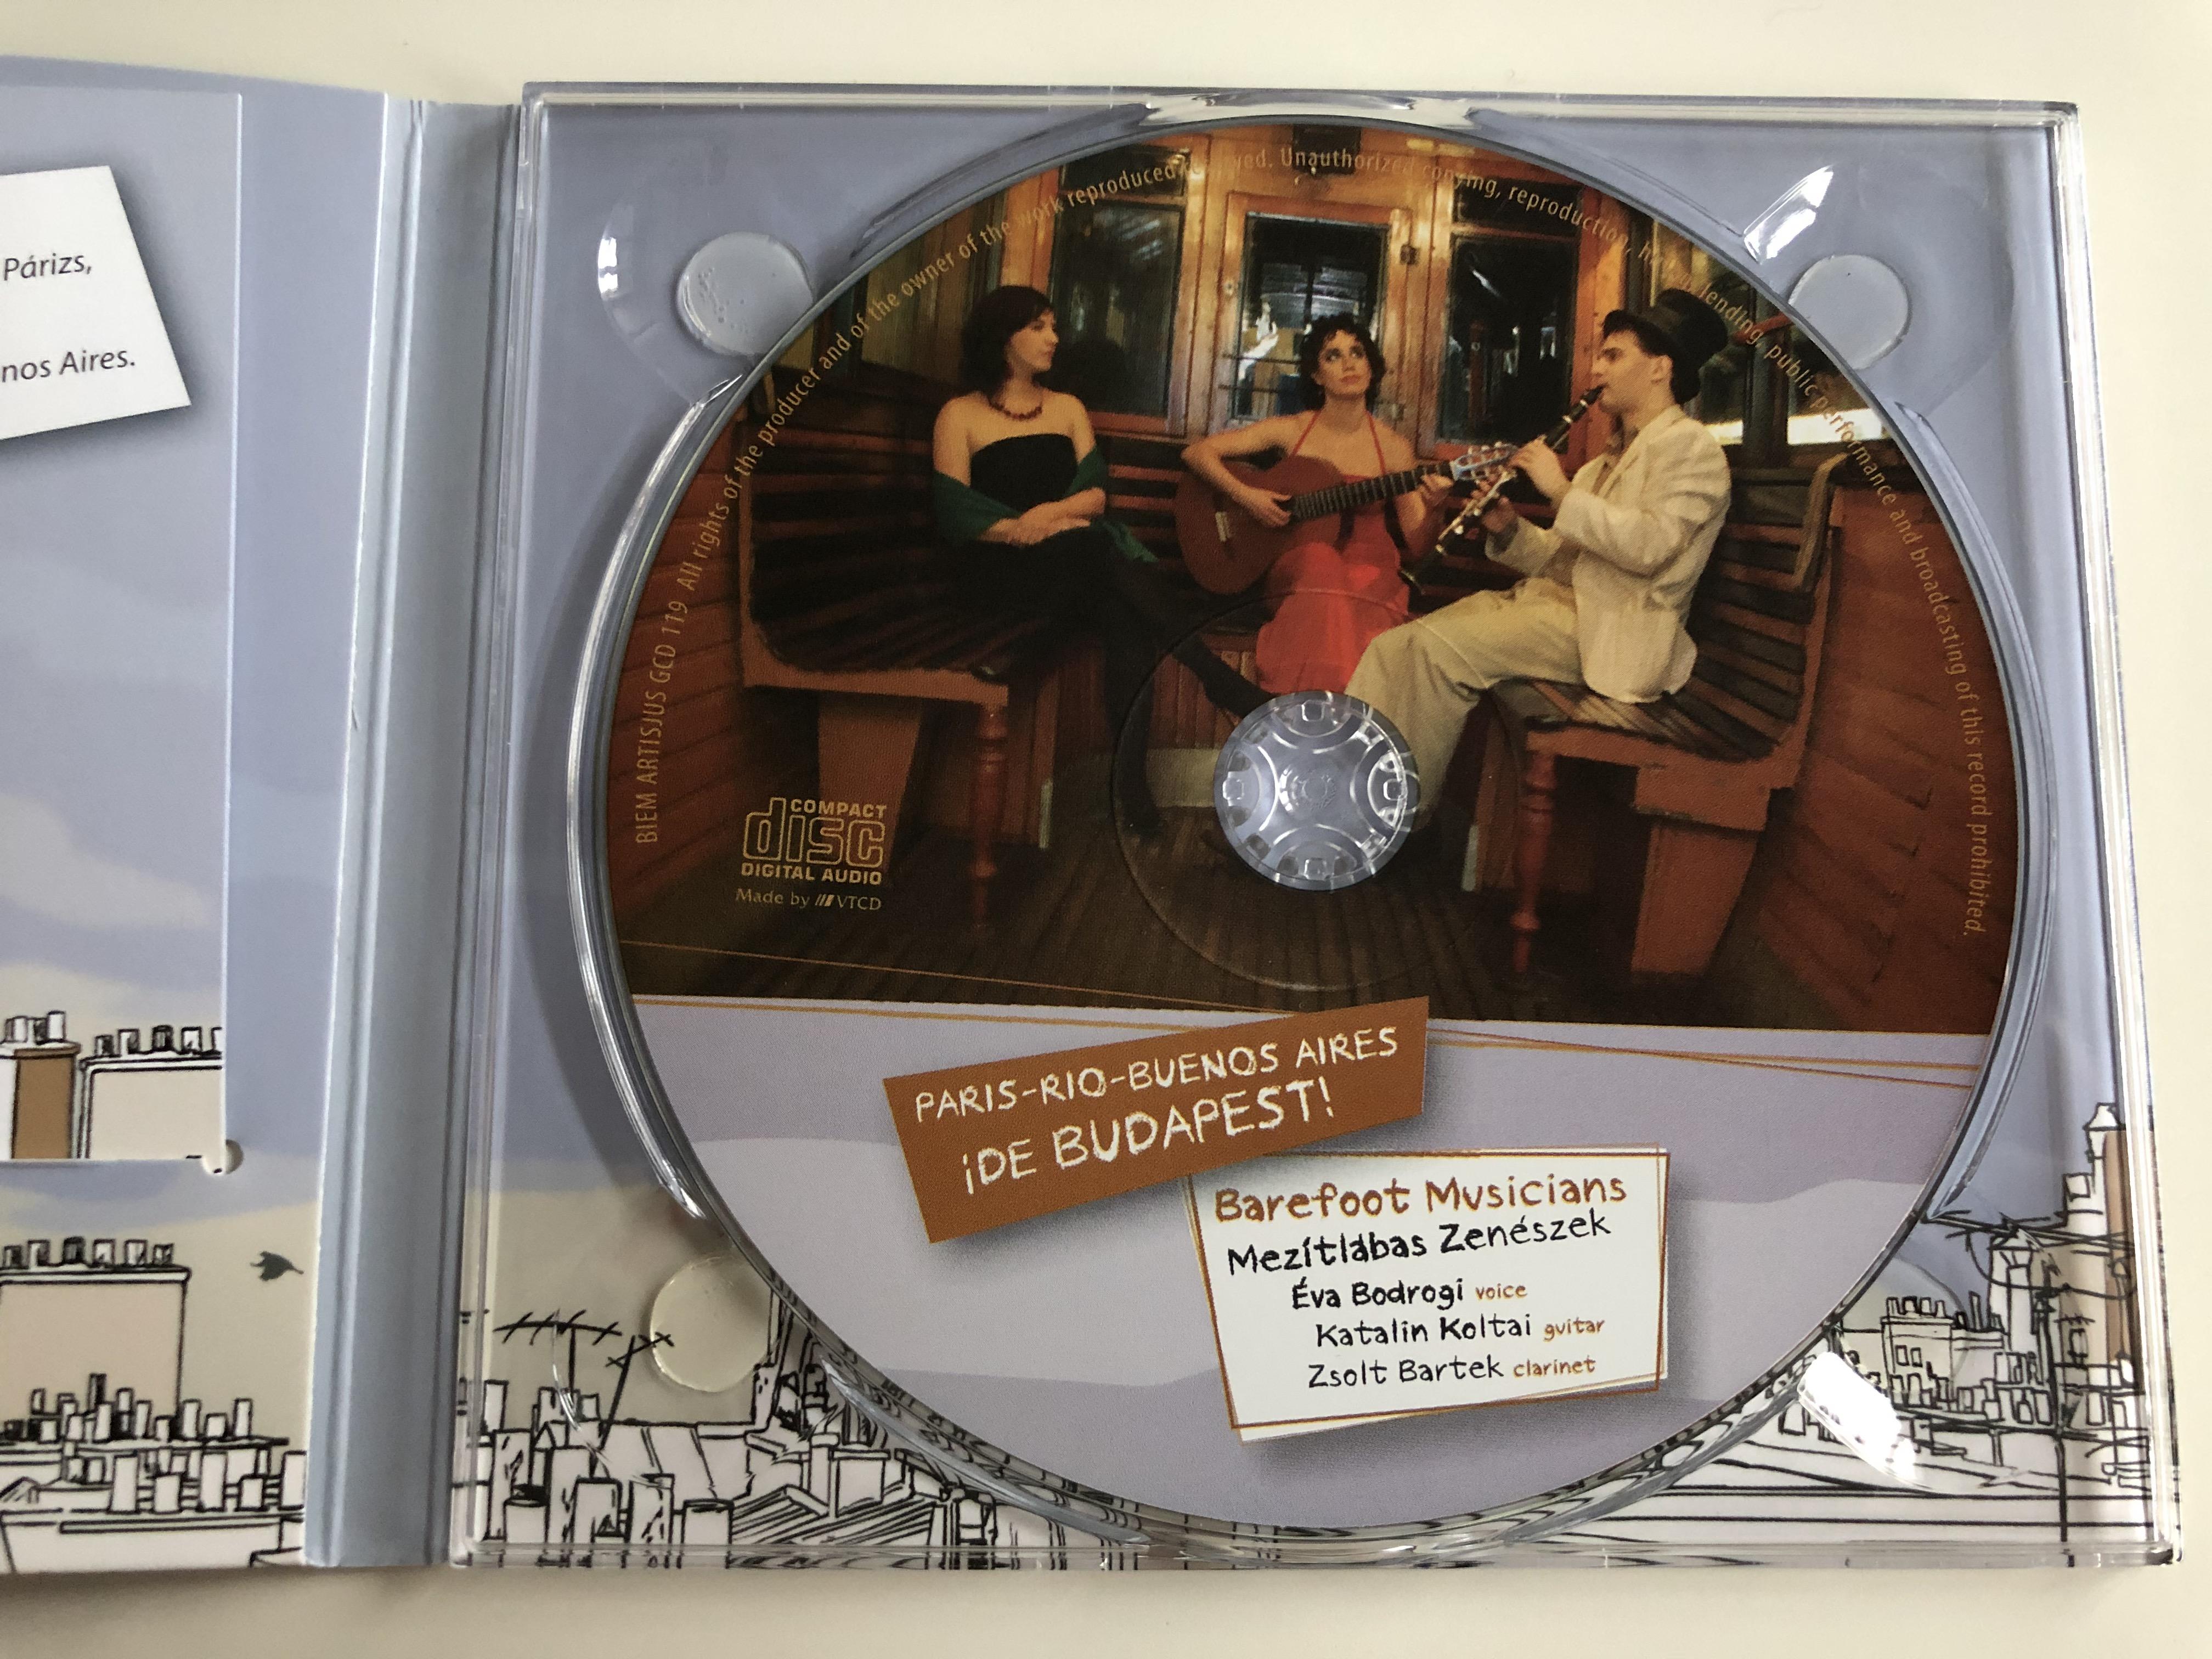 paris-rio-buenos-aires-ide-budapest-barefoot-musicians-mezitlabas-zeneszek-eva-bodrogi-voice-katalin-koltai-guitar-zsolt-bartek-clarinet-gryllus-audio-cd-hcd-119-3-.jpg